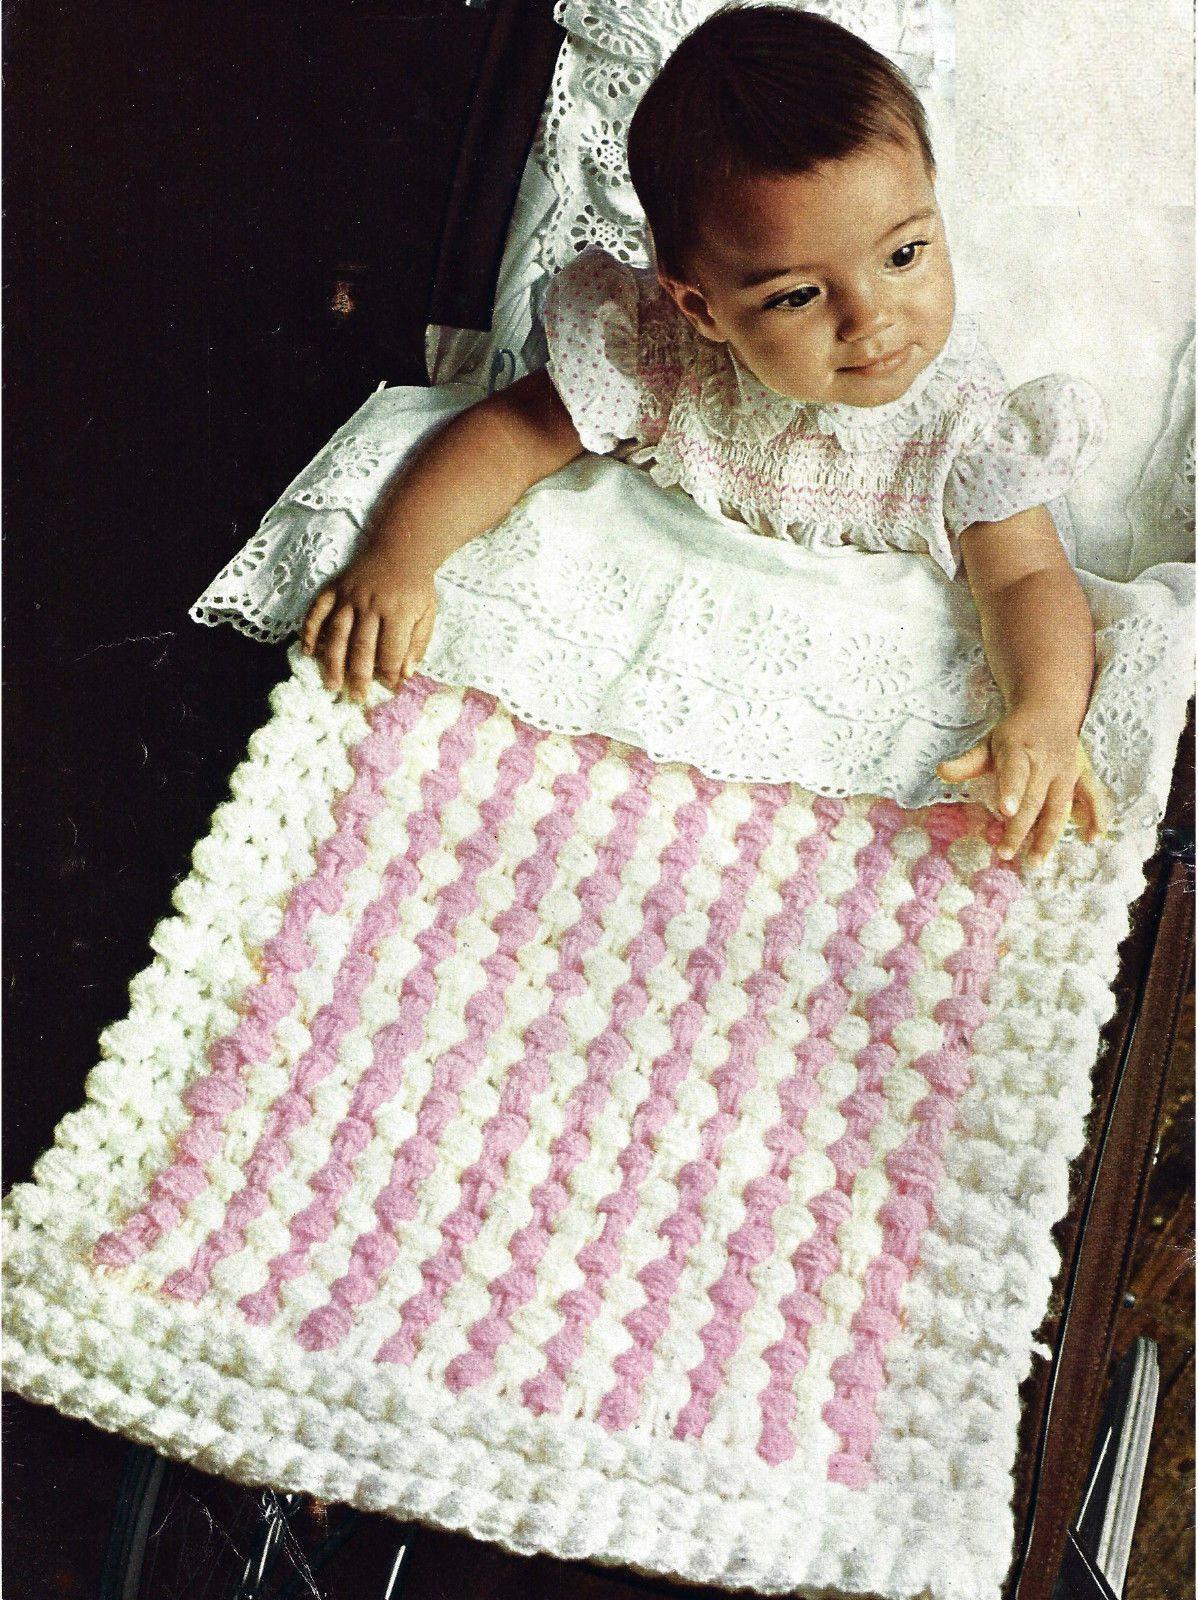 Baby pram cot rug cover blanket fast easy knit pattern 562 baby baby pram cot rug cover blanket fast easy knit pattern 562 dt1010fo